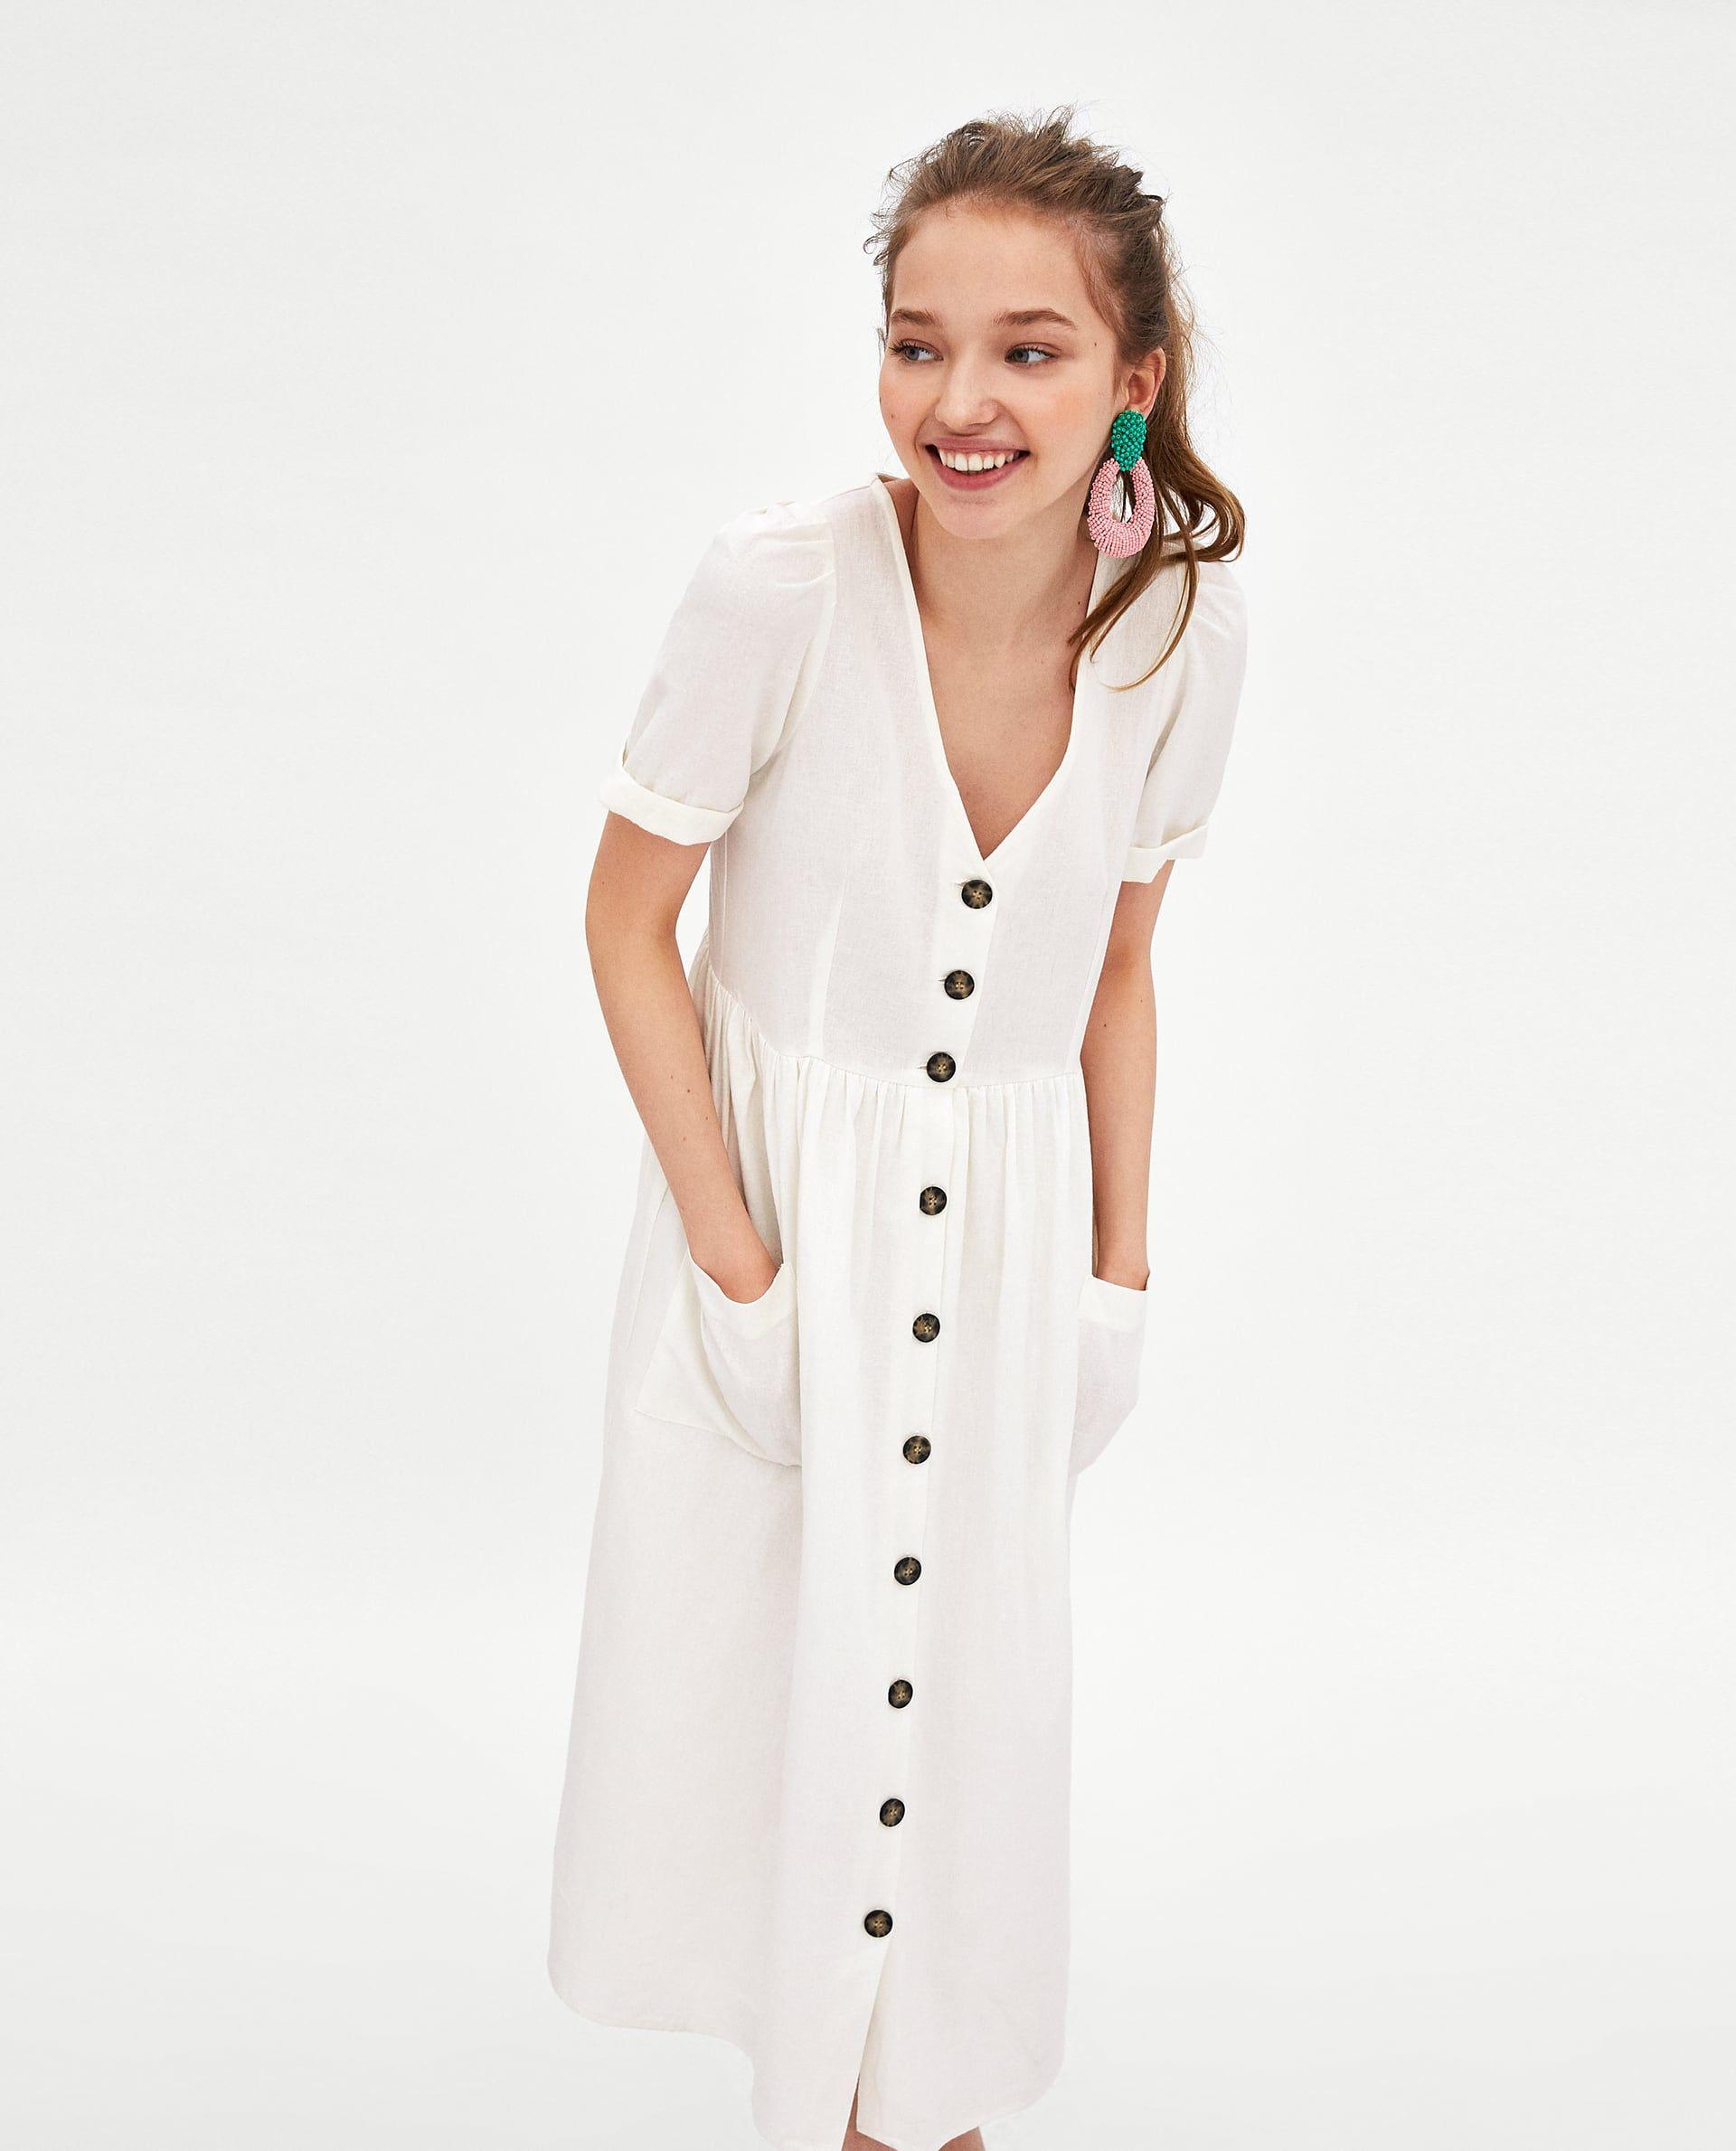 Vestido lino blanco botones zara